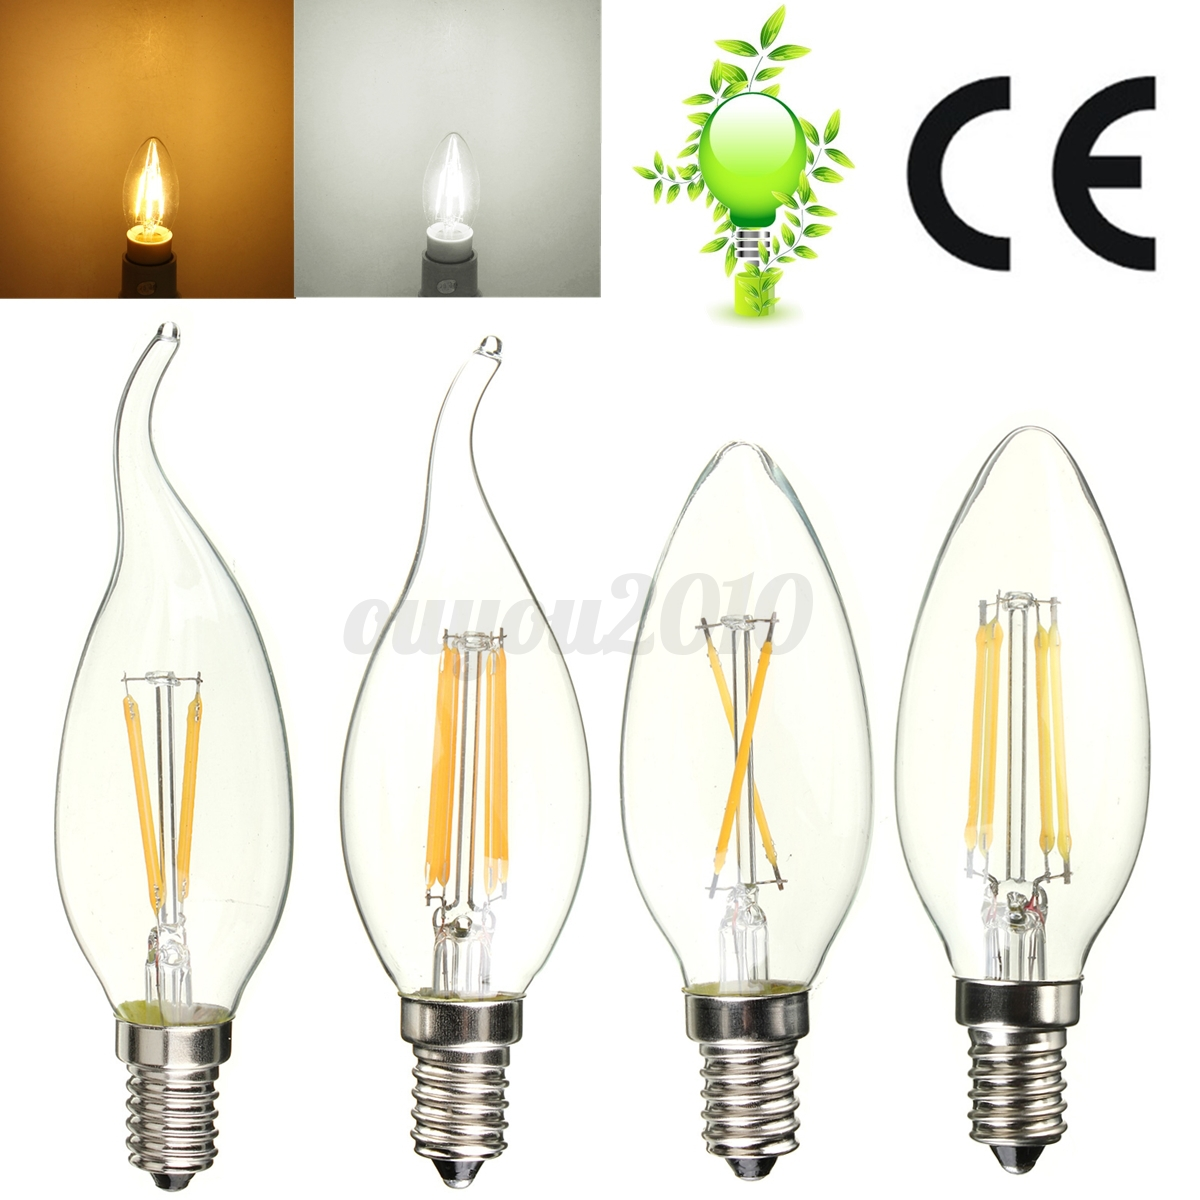 e14 2w 4w edison cob led filament gl hbirne kerzen lampe. Black Bedroom Furniture Sets. Home Design Ideas